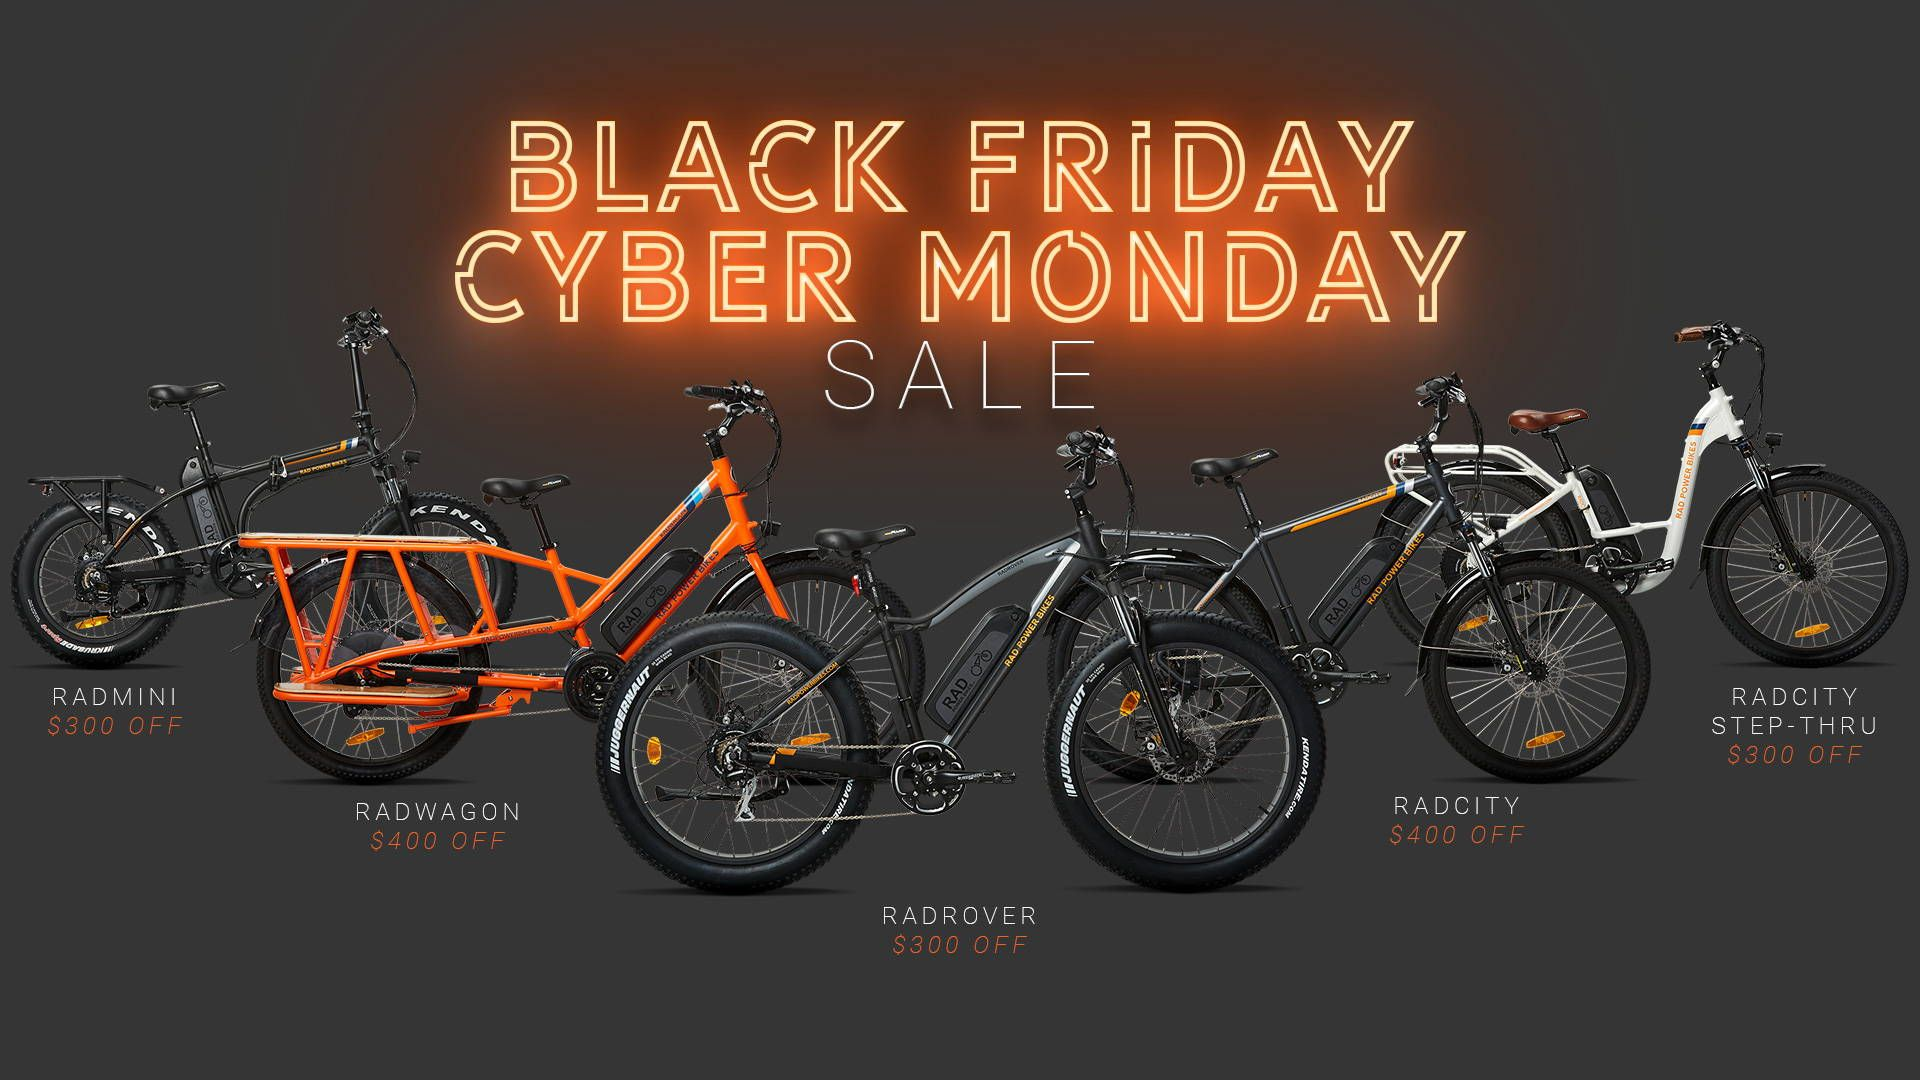 Black Friday Cyber Monday 2018 Rad Power Bikes Black Friday Black Friday Cyber Monday Cyber Monday